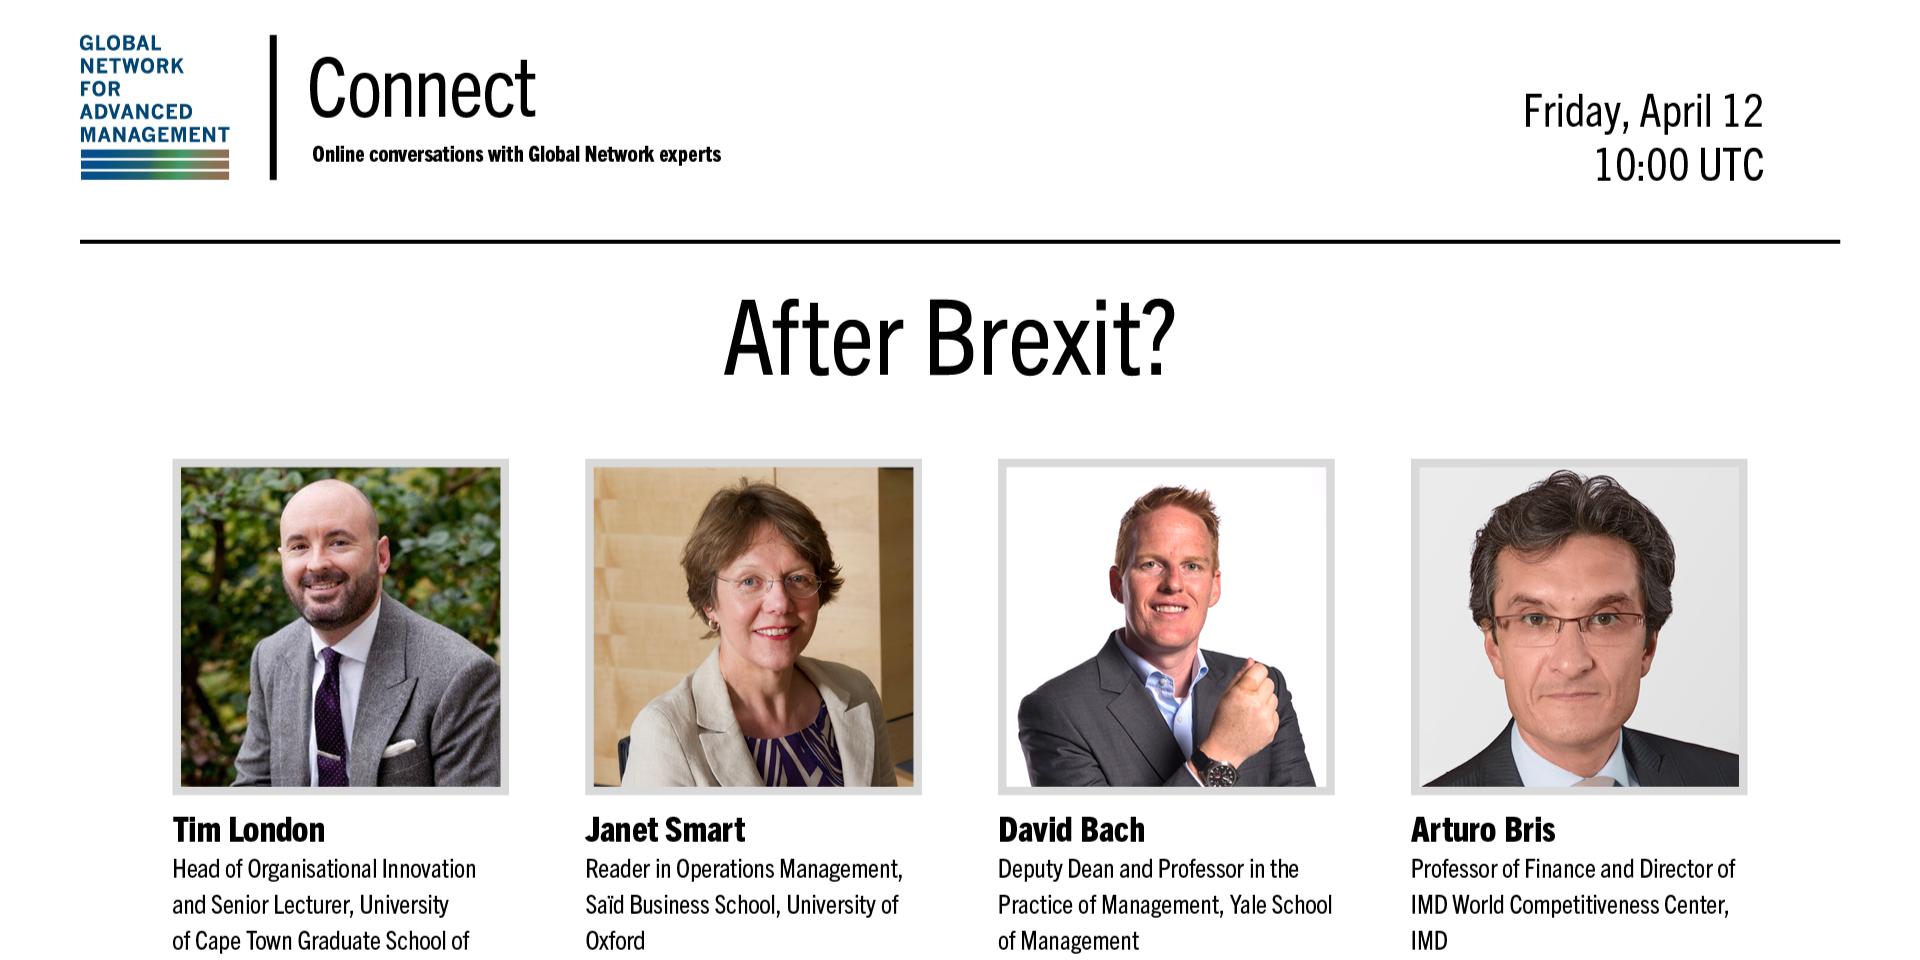 [WEBINAR] Global Network Connect: After Brexit?